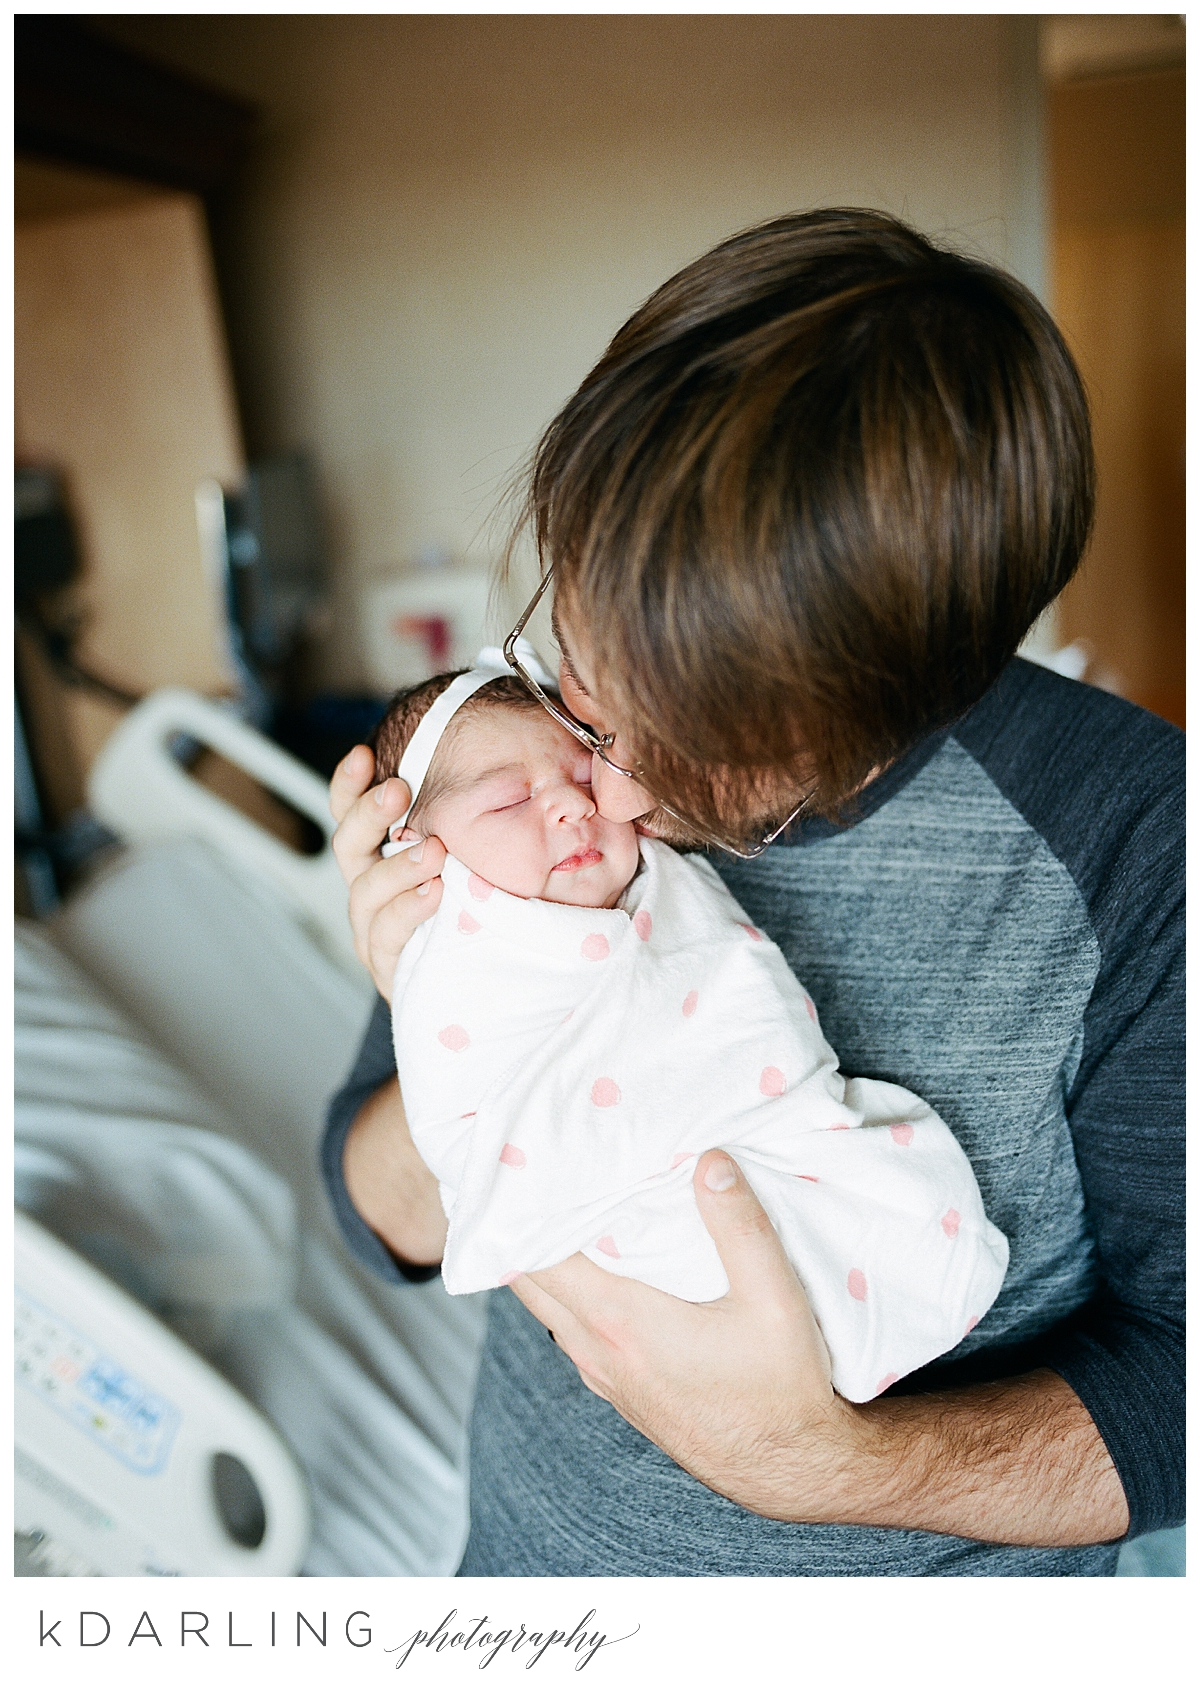 Fresh-48-hospital-newborn-photography-Carle-Urbana-Champaign-Central-IL-film_0050.jpg